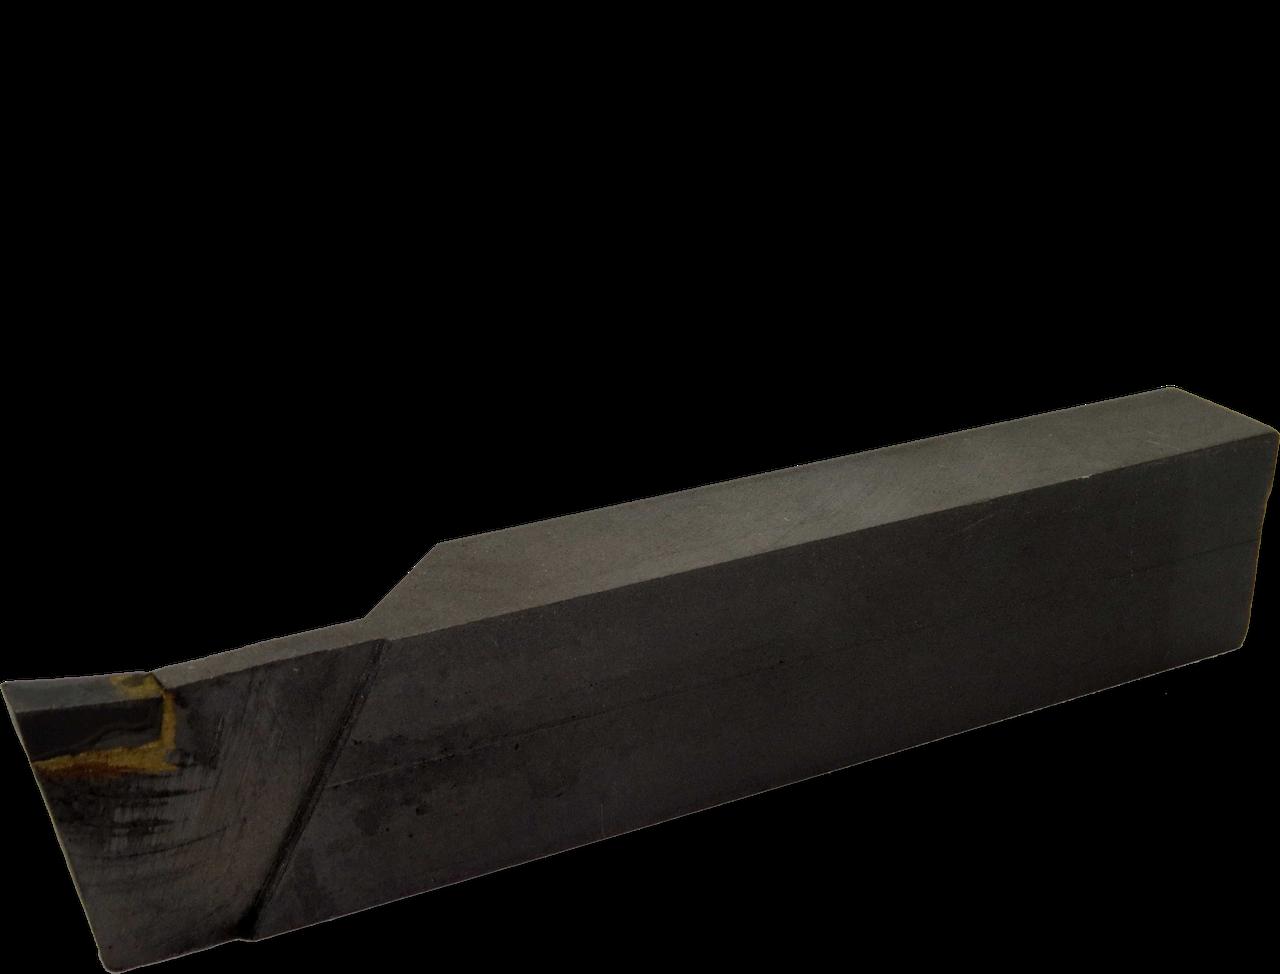 Резец 25х16х140 (Т15К6) отрезной токарный СИТО (Беларусь)